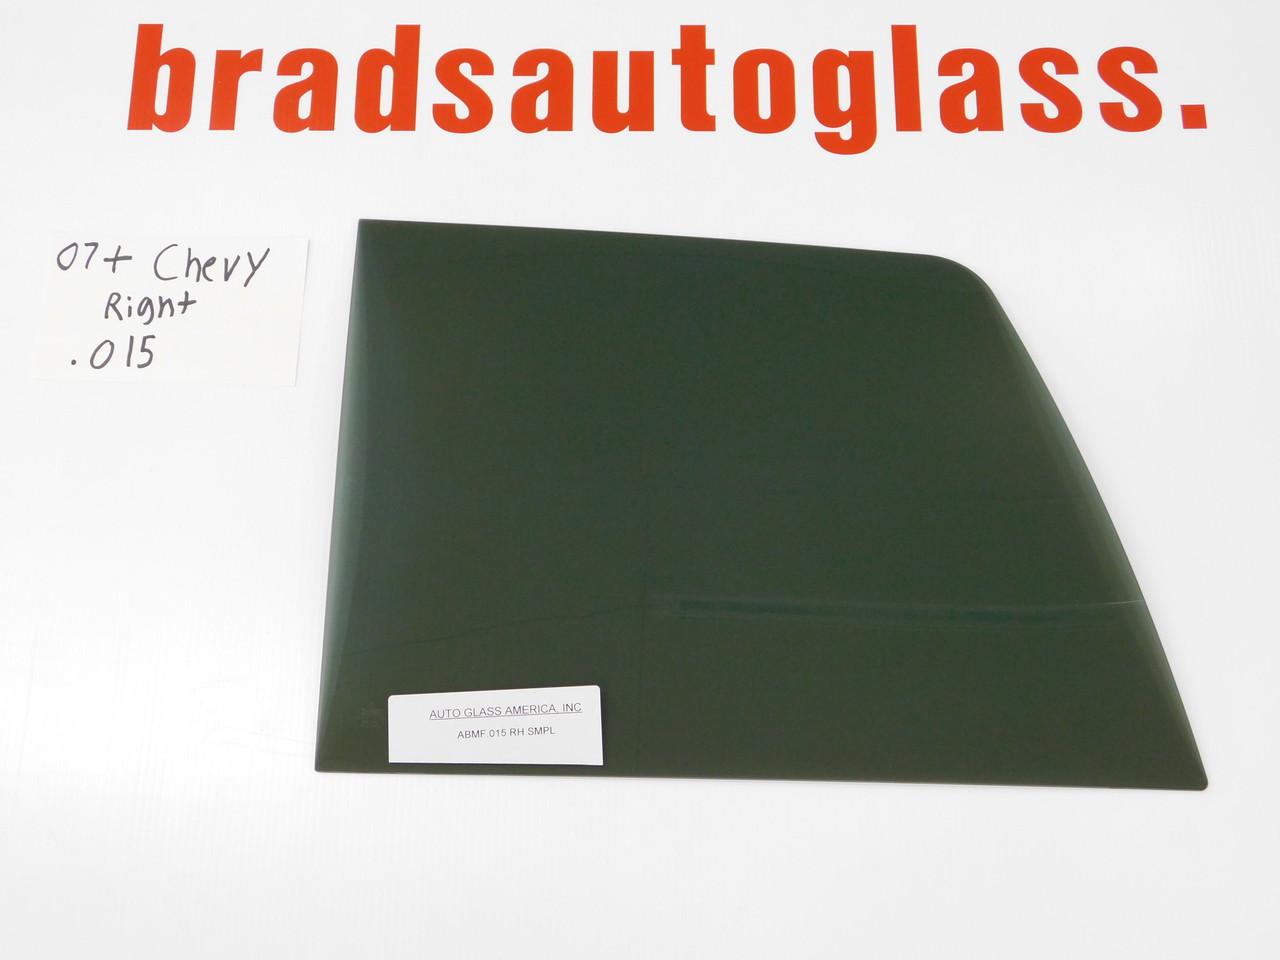 07-13 1500, 07-14 2500, 3500 Chevrolet Silverado GMC sliding rear window back glass RIGHT patch panel